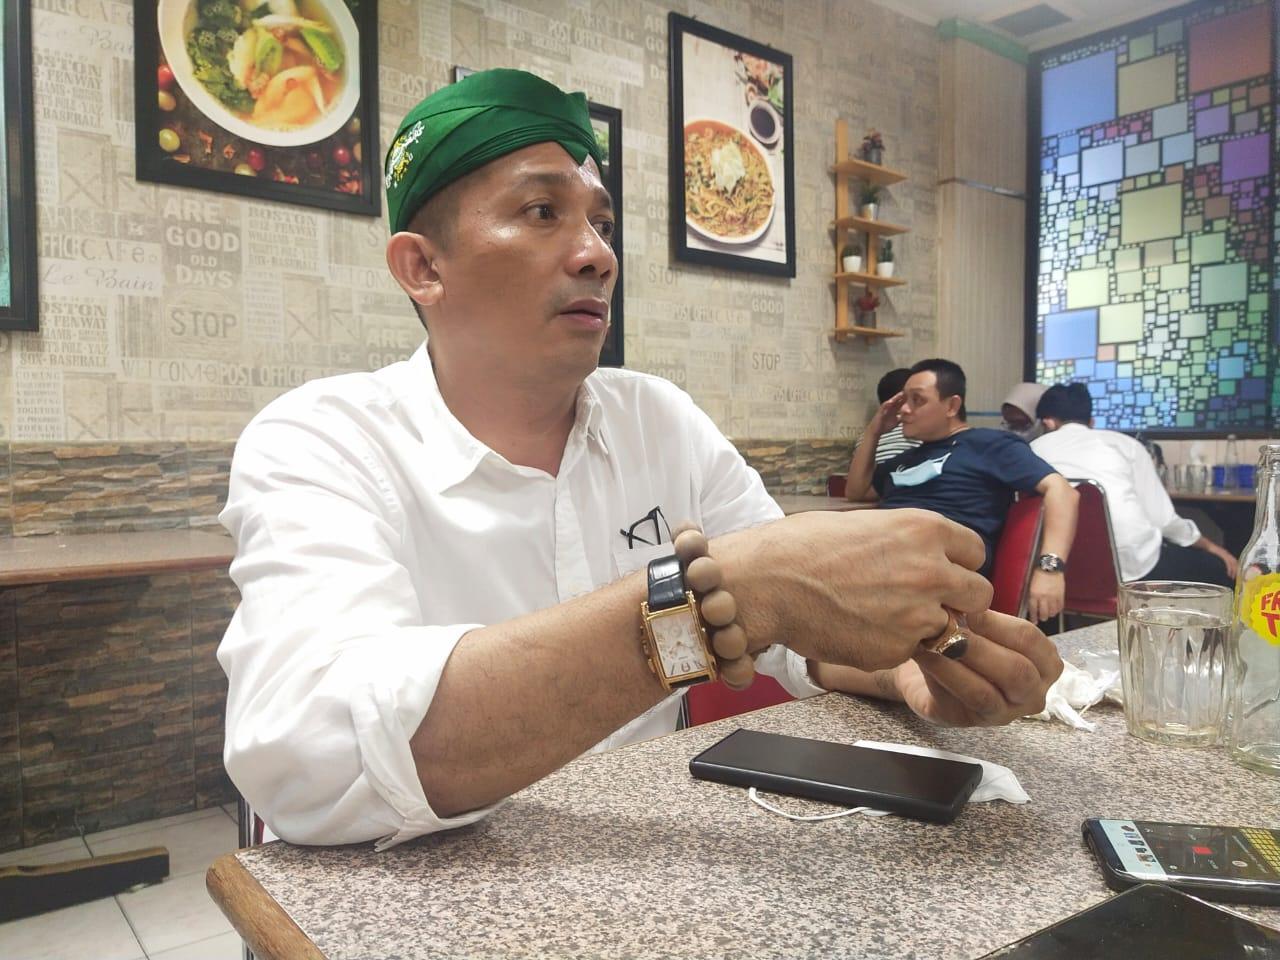 Jawab Kritikan 100 Hari Kerja, Bupati Adil: Mereka Tong Kosong, Asal Bunyi Saja